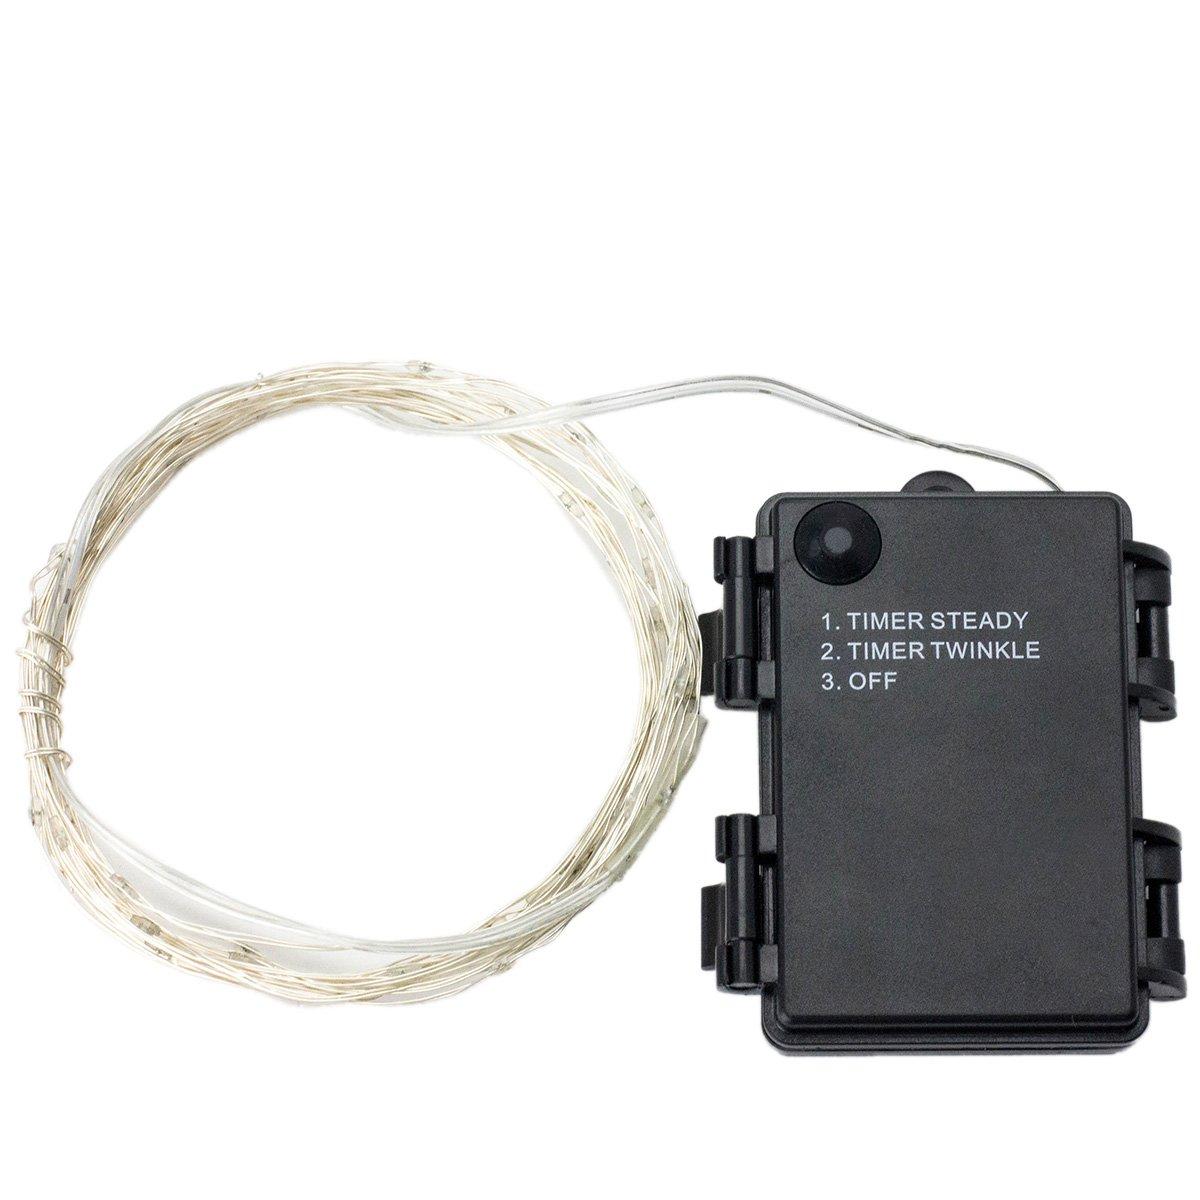 DUMVOIN Cadena Cuerda Luz Flexible m Ft con LEDs de Alambre de